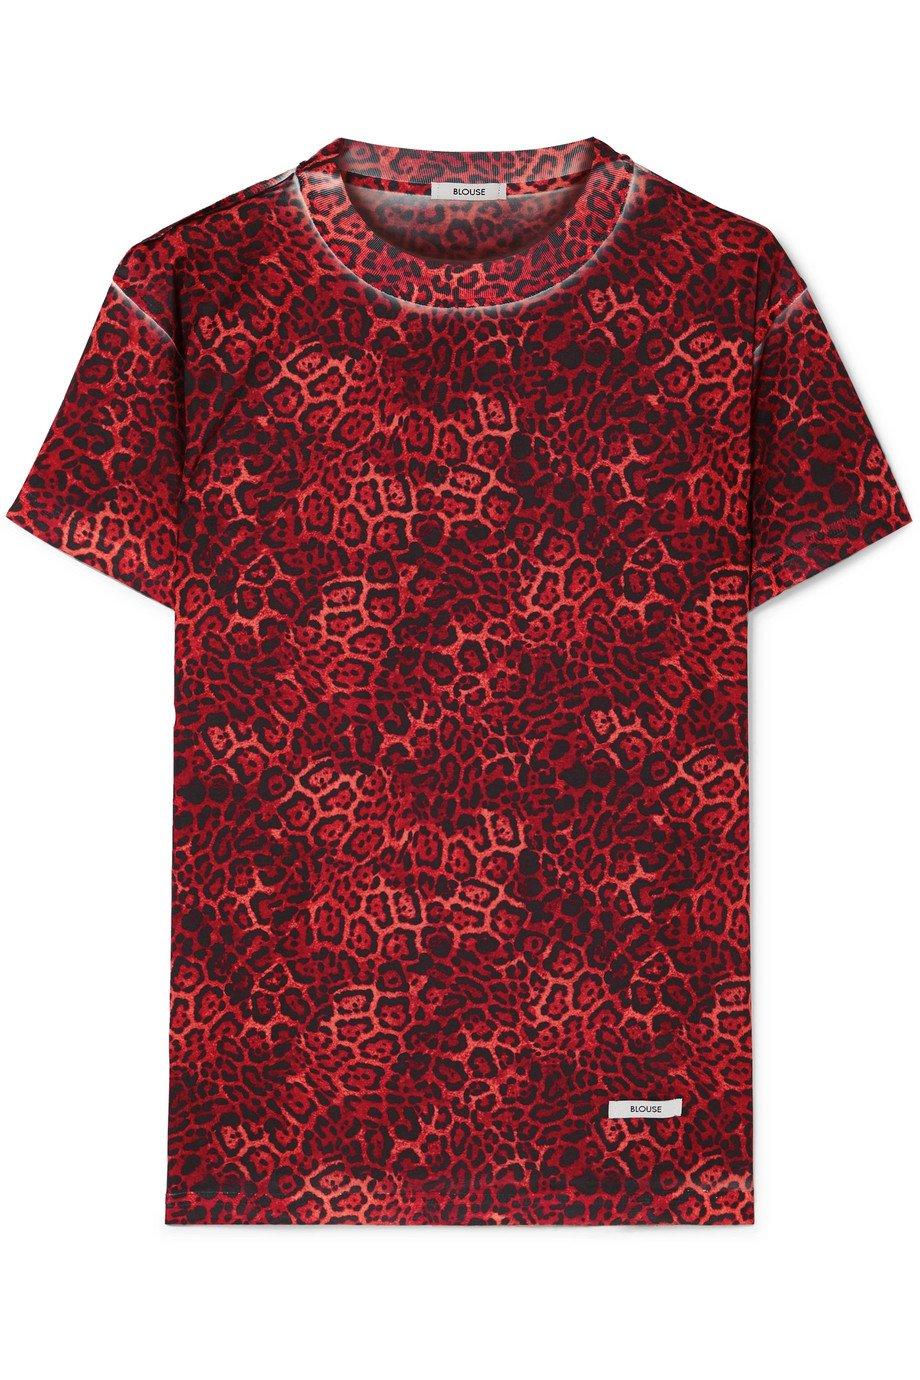 BLOUSE | Castiglione leopard-print jersey T-shirt | NET-A-PORTER.COM